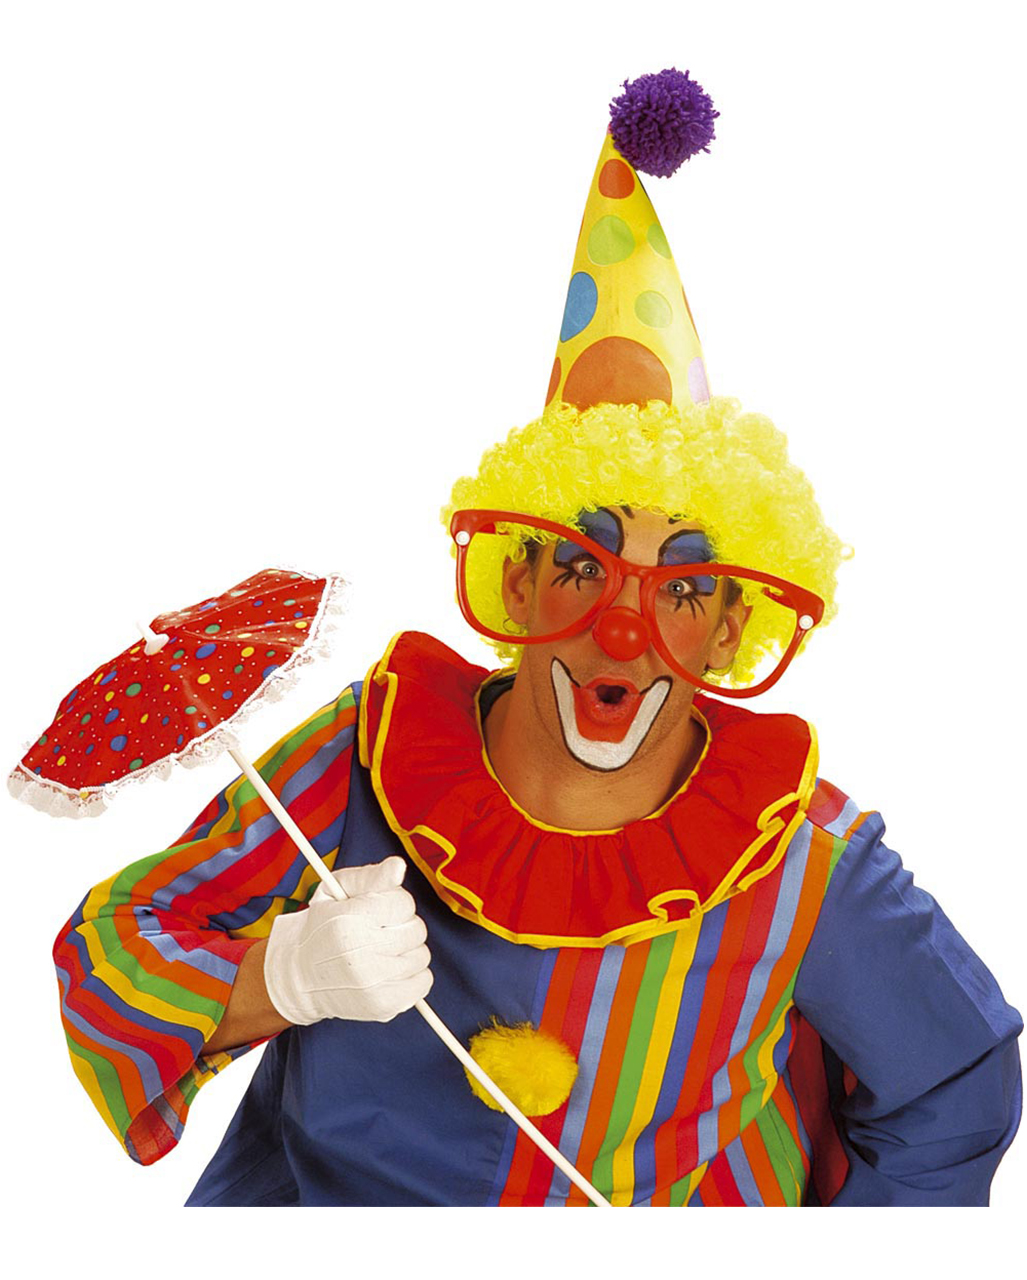 riesenbrille rot clown brille zirkus zubeh r clownsbrille karneval universe. Black Bedroom Furniture Sets. Home Design Ideas